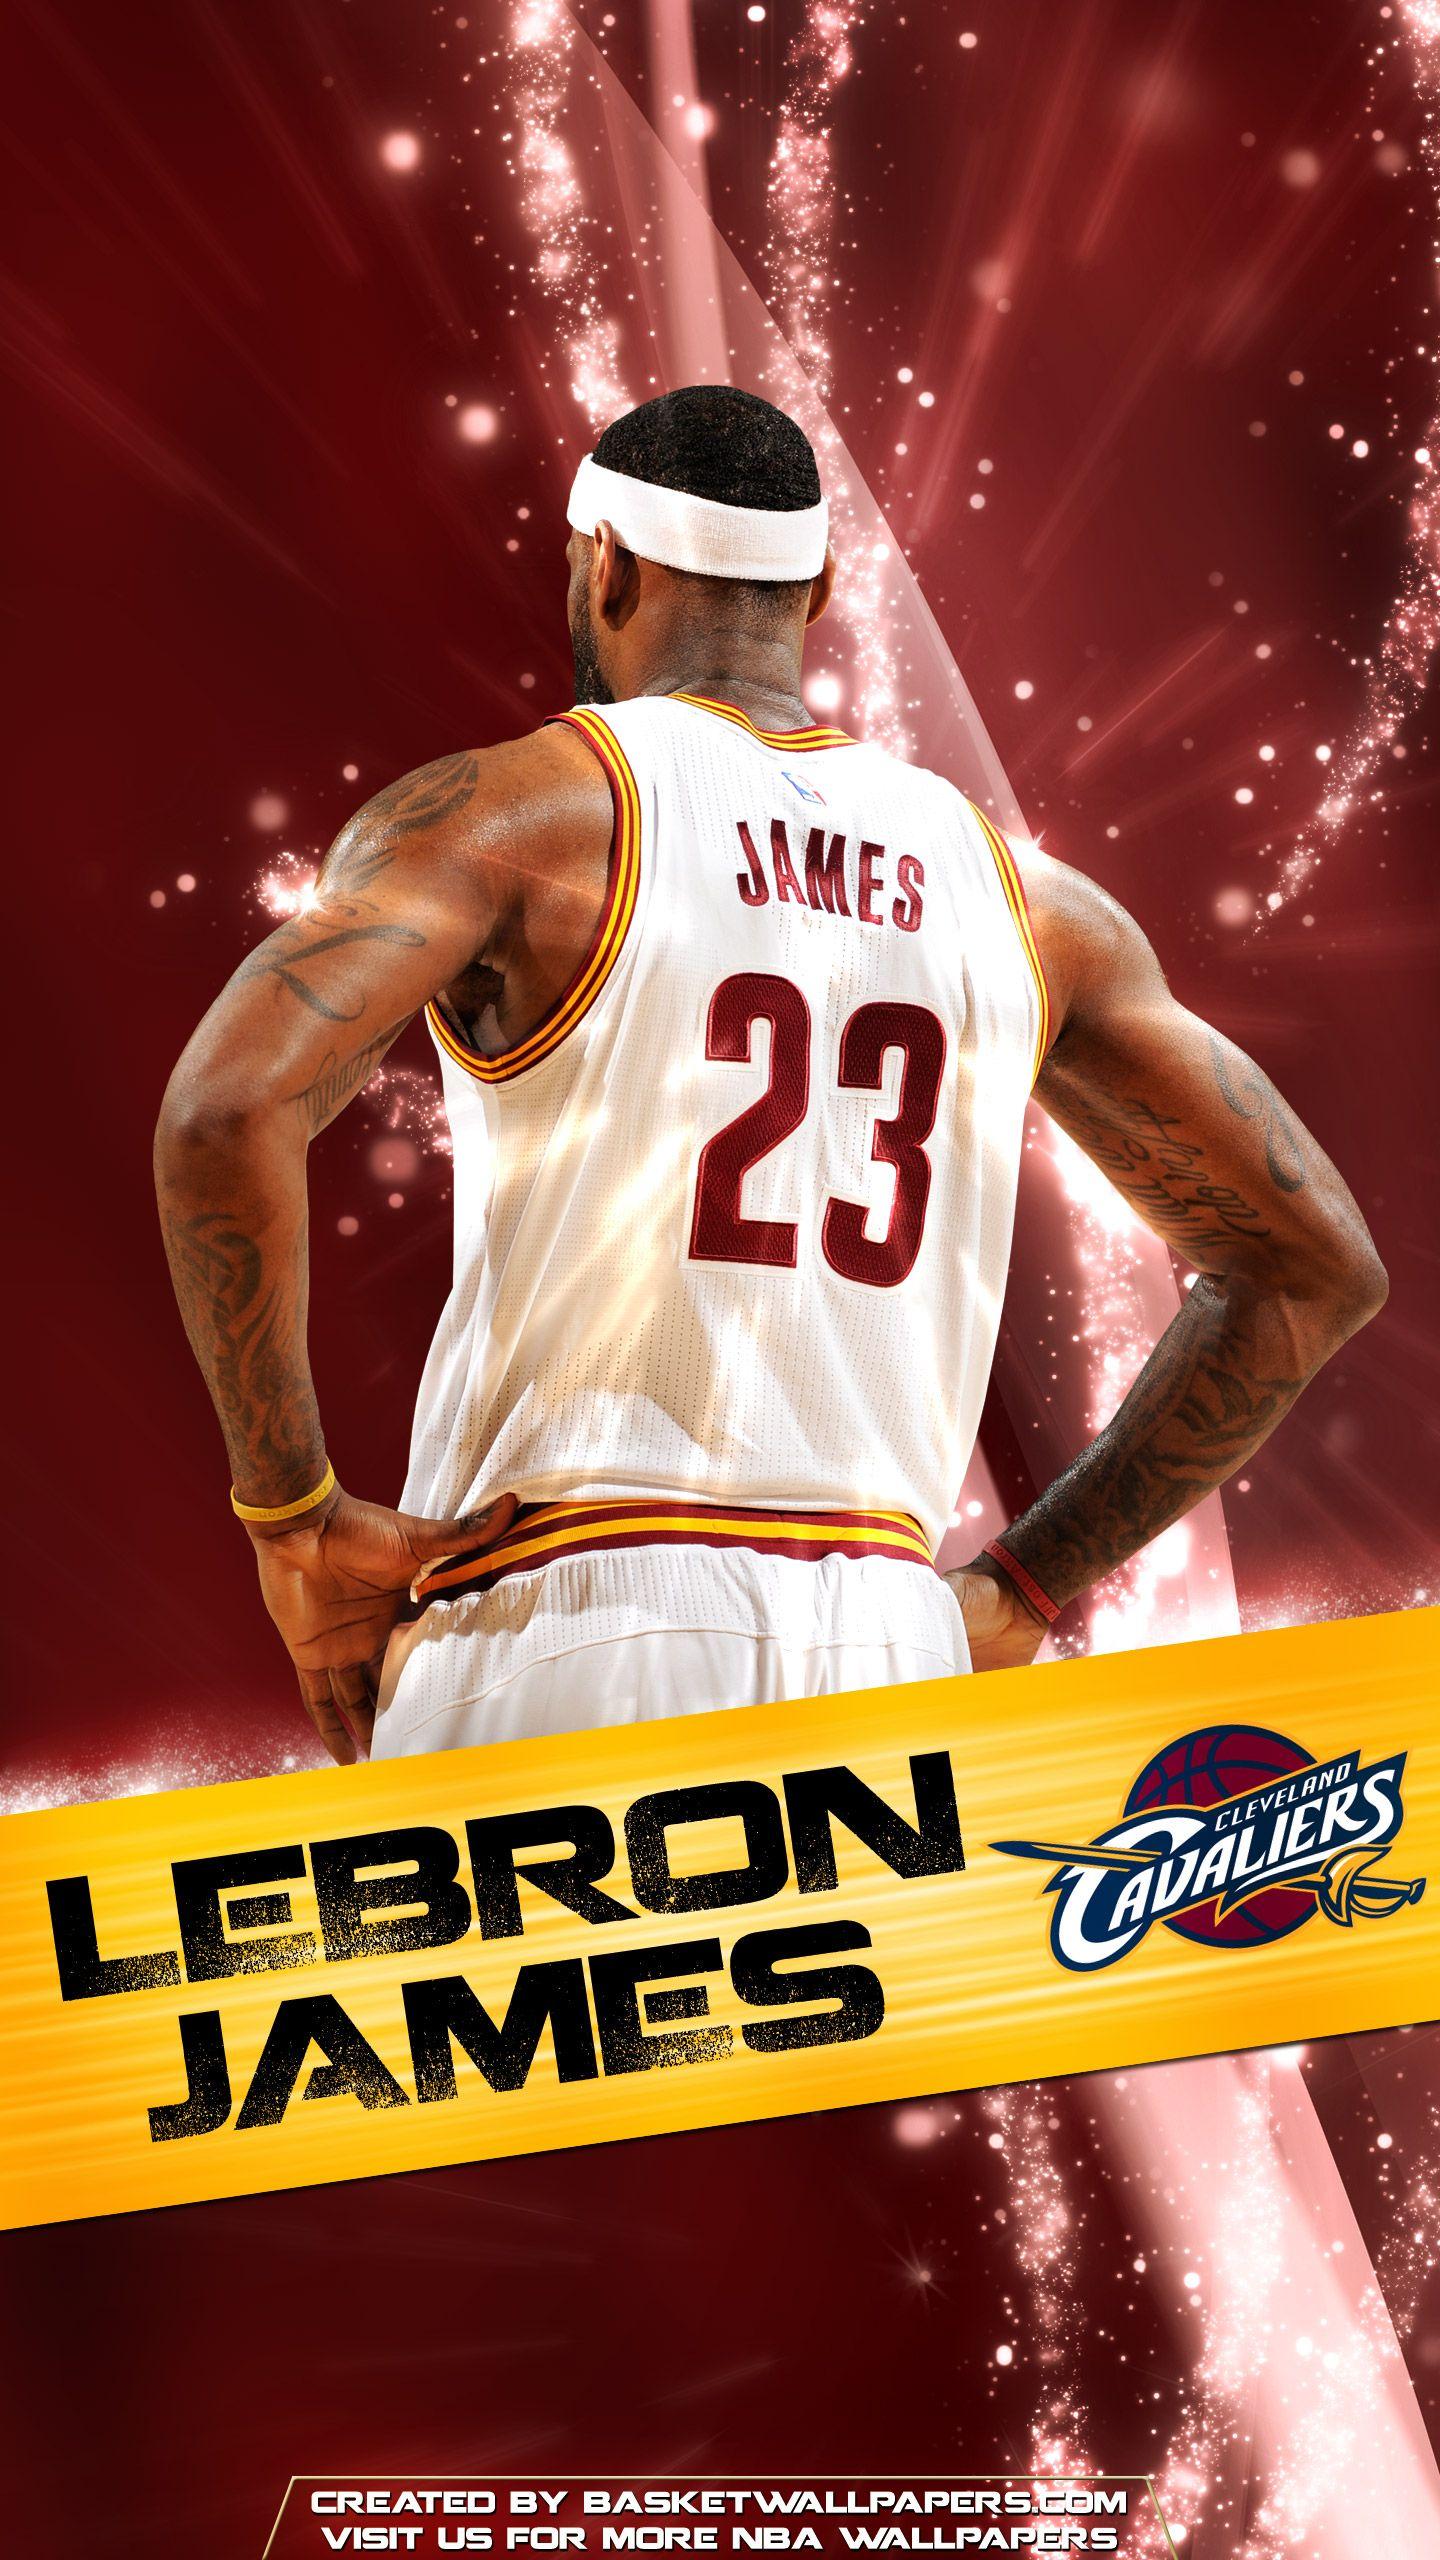 Lebron James Basketball Players Cavaliers Wallpaper Wallpapers